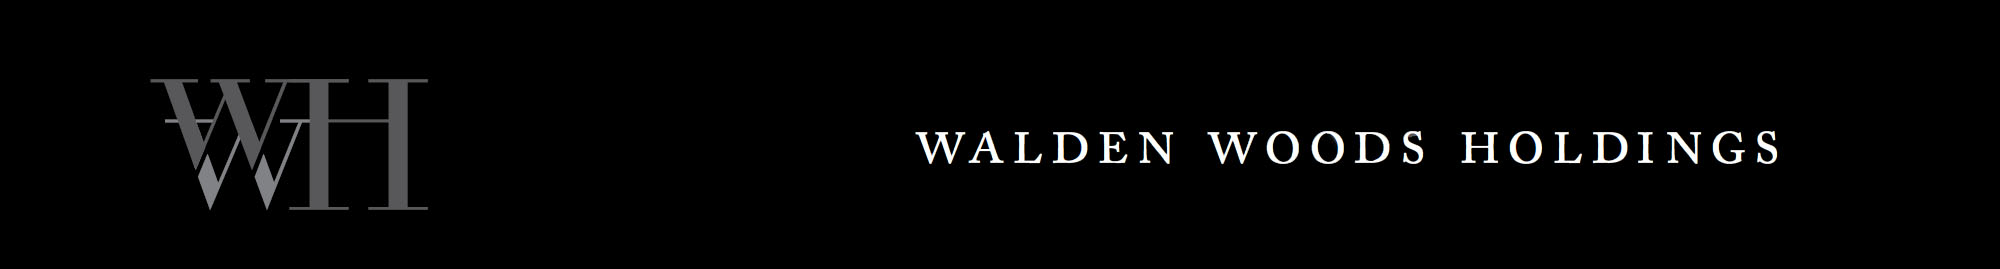 Walden Woods Holdings